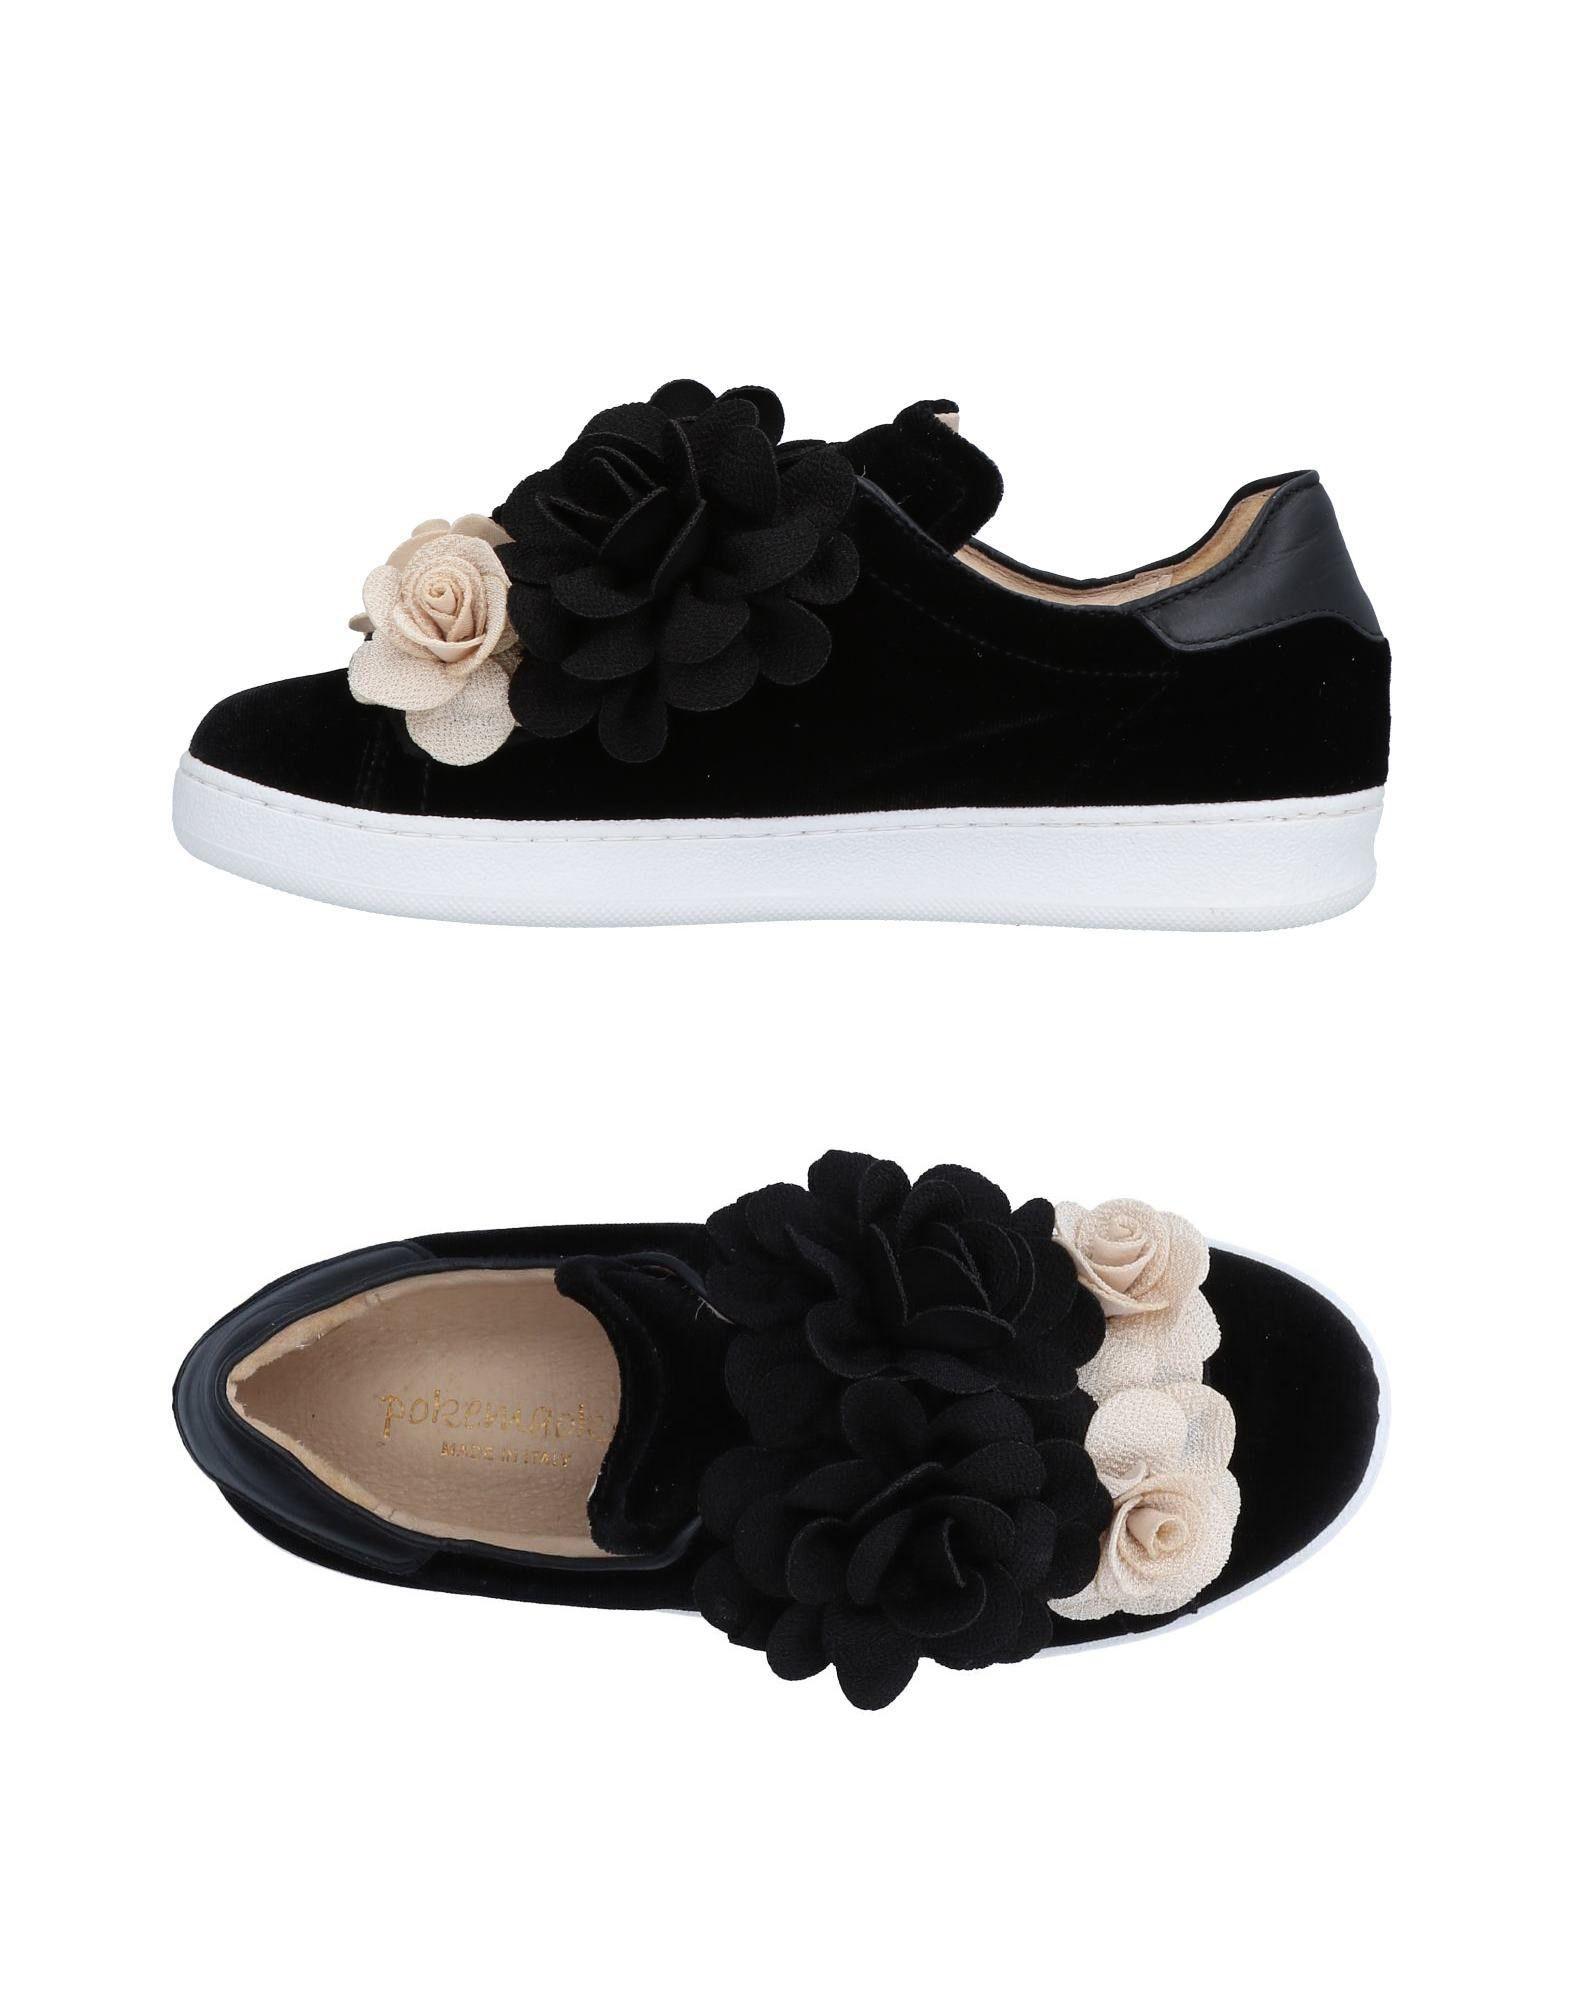 Moda Sneakers Pokemaoke Donna - 11506551XE